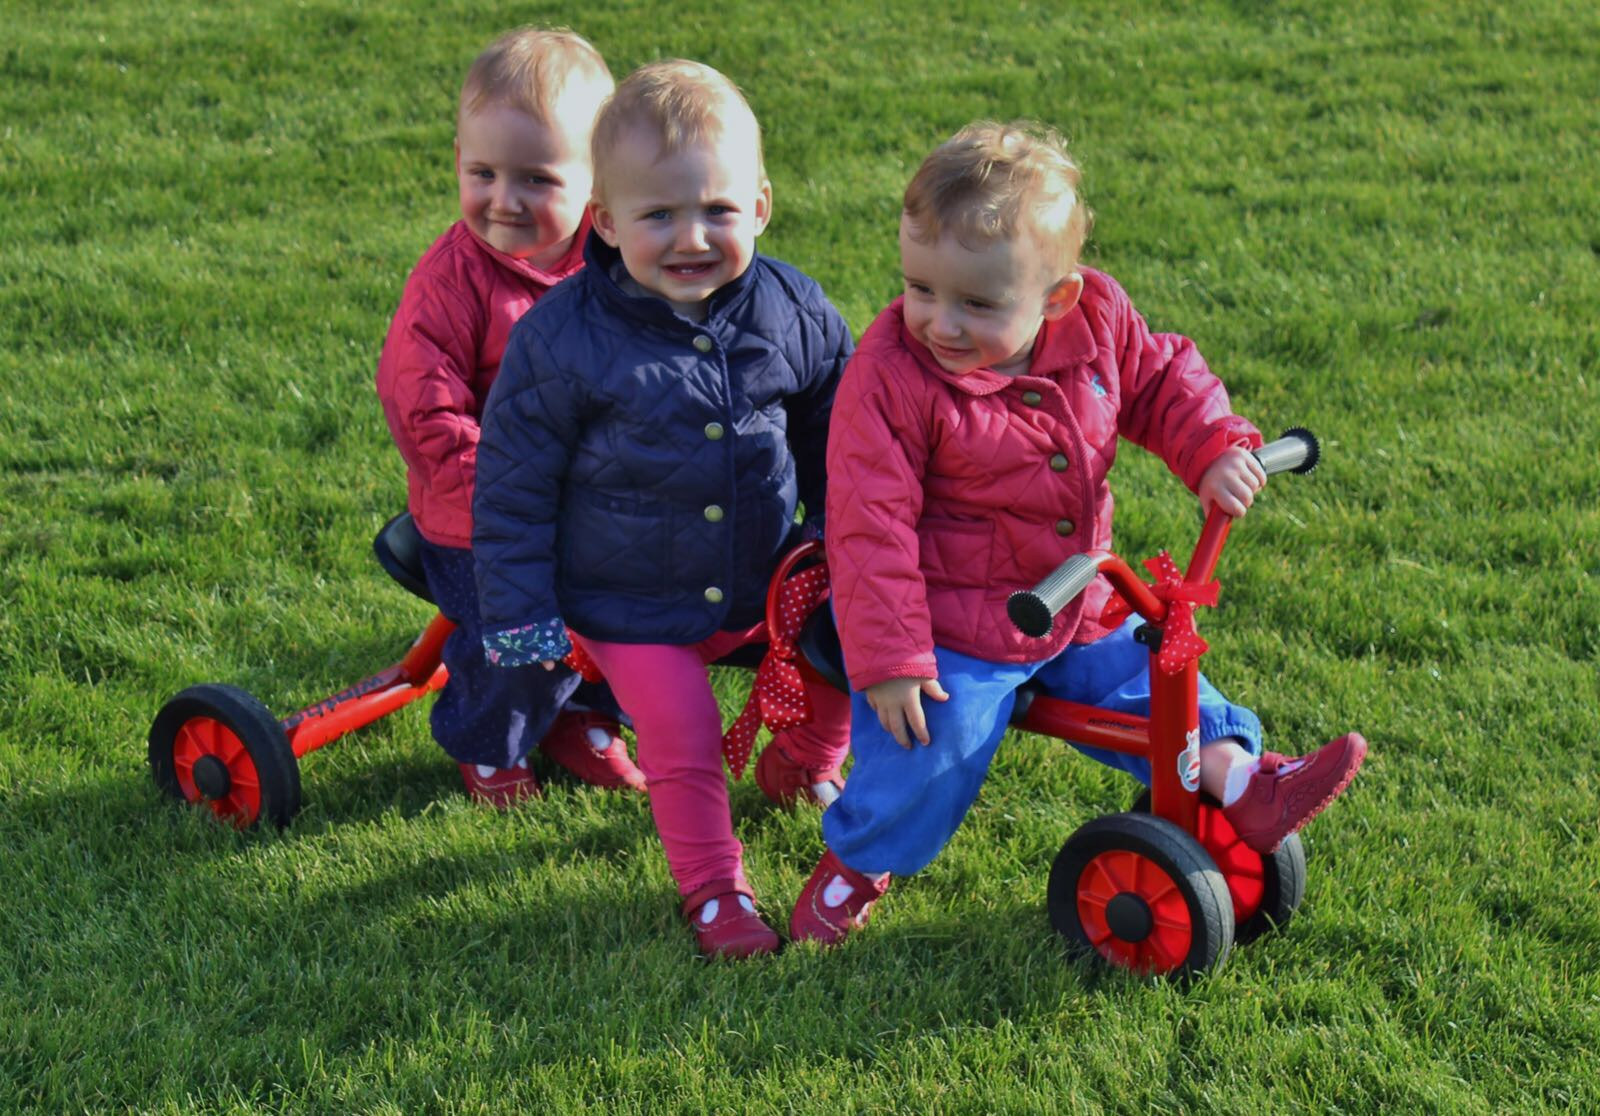 Triplet-Trike